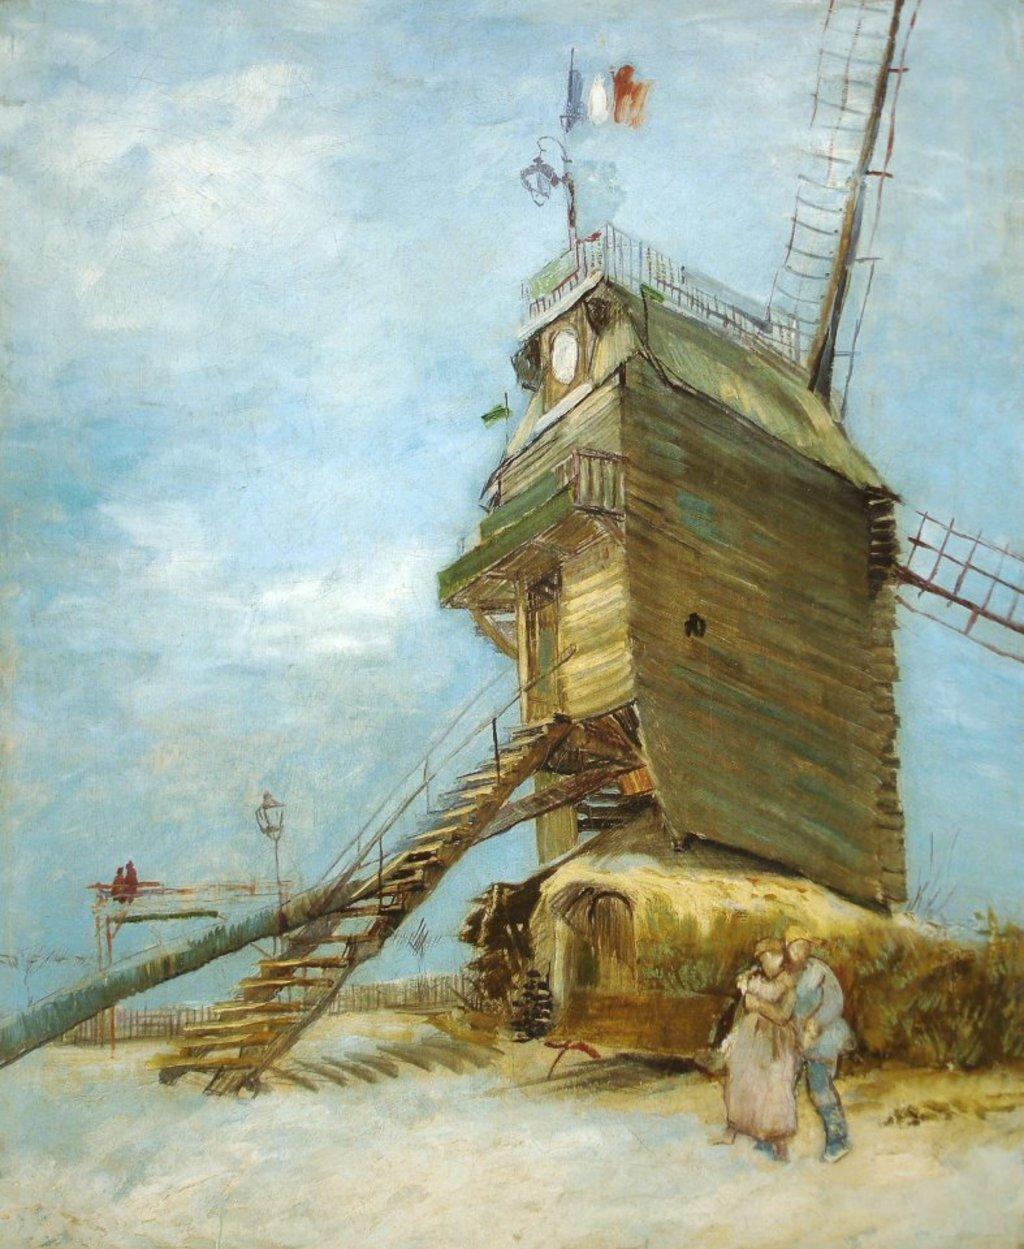 Van_Gogh_-_Le_Moulin_de_la_Galette5.jpeg?1557407826